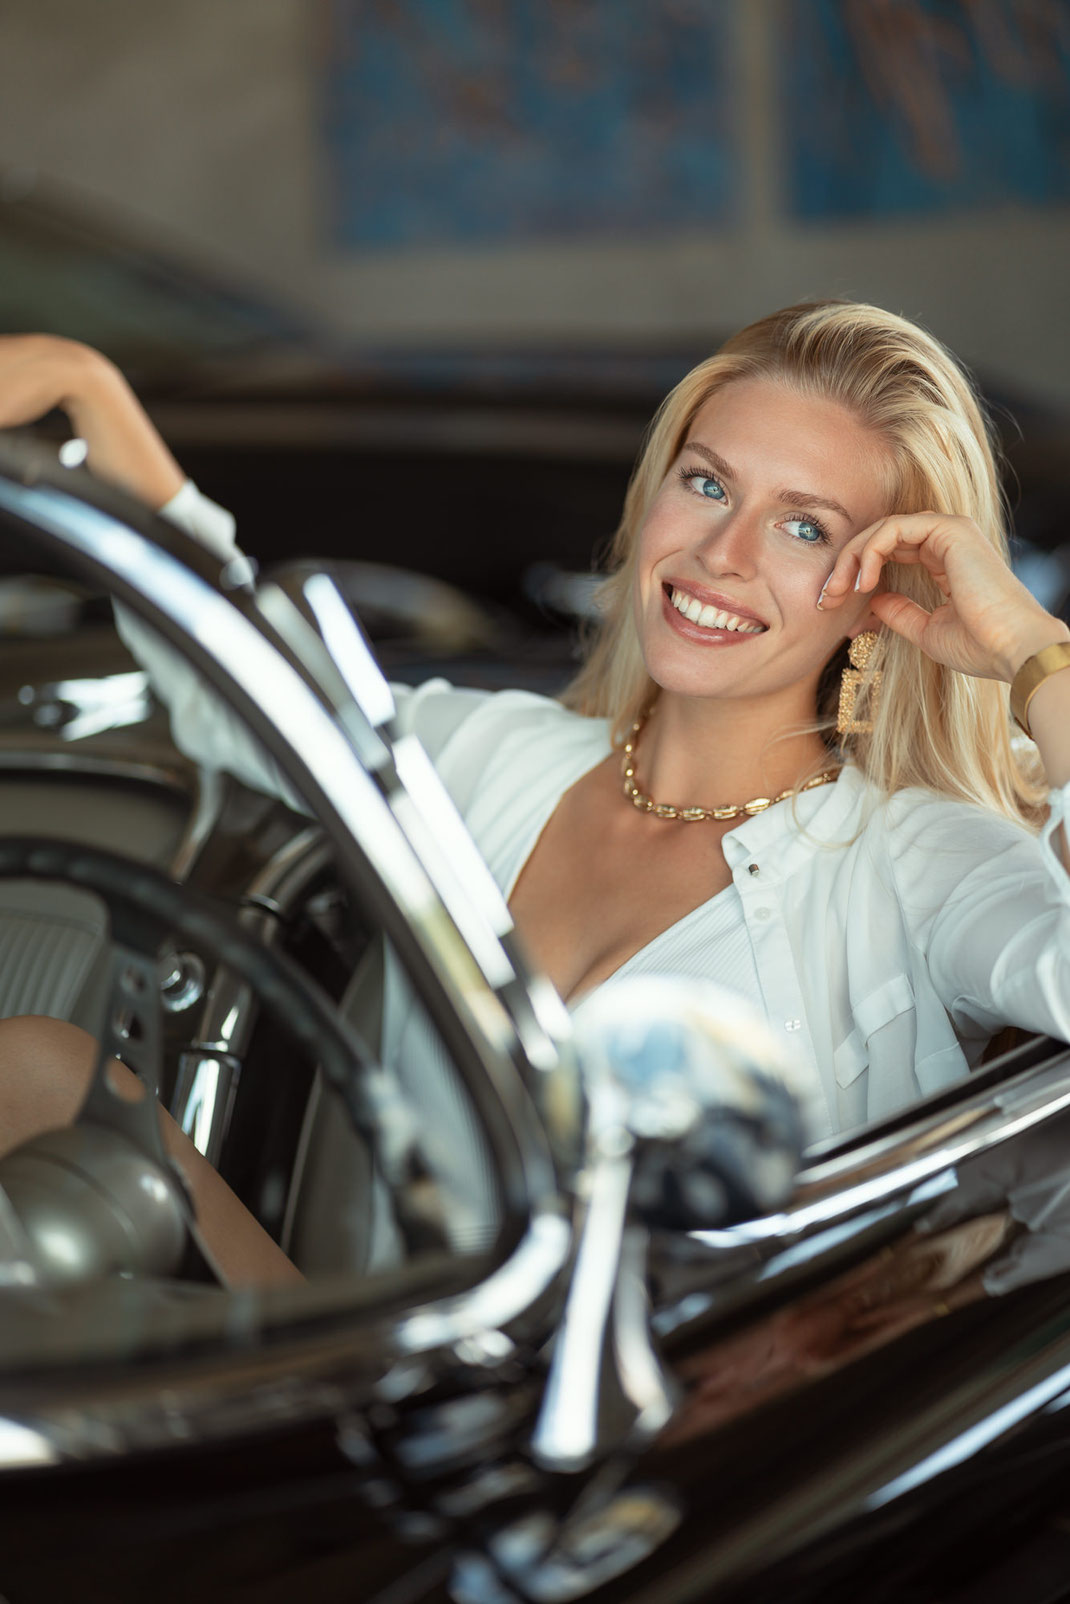 Ambition is a dream with a V8 engine (Elvis Presley) - Lisa - Markus Hertzsch - Chevrolet Corvette C1 - V8 - Car - Model - Girl - Portrait - Hat - Look - BW - Mustang - Classiccar - Oldtimer